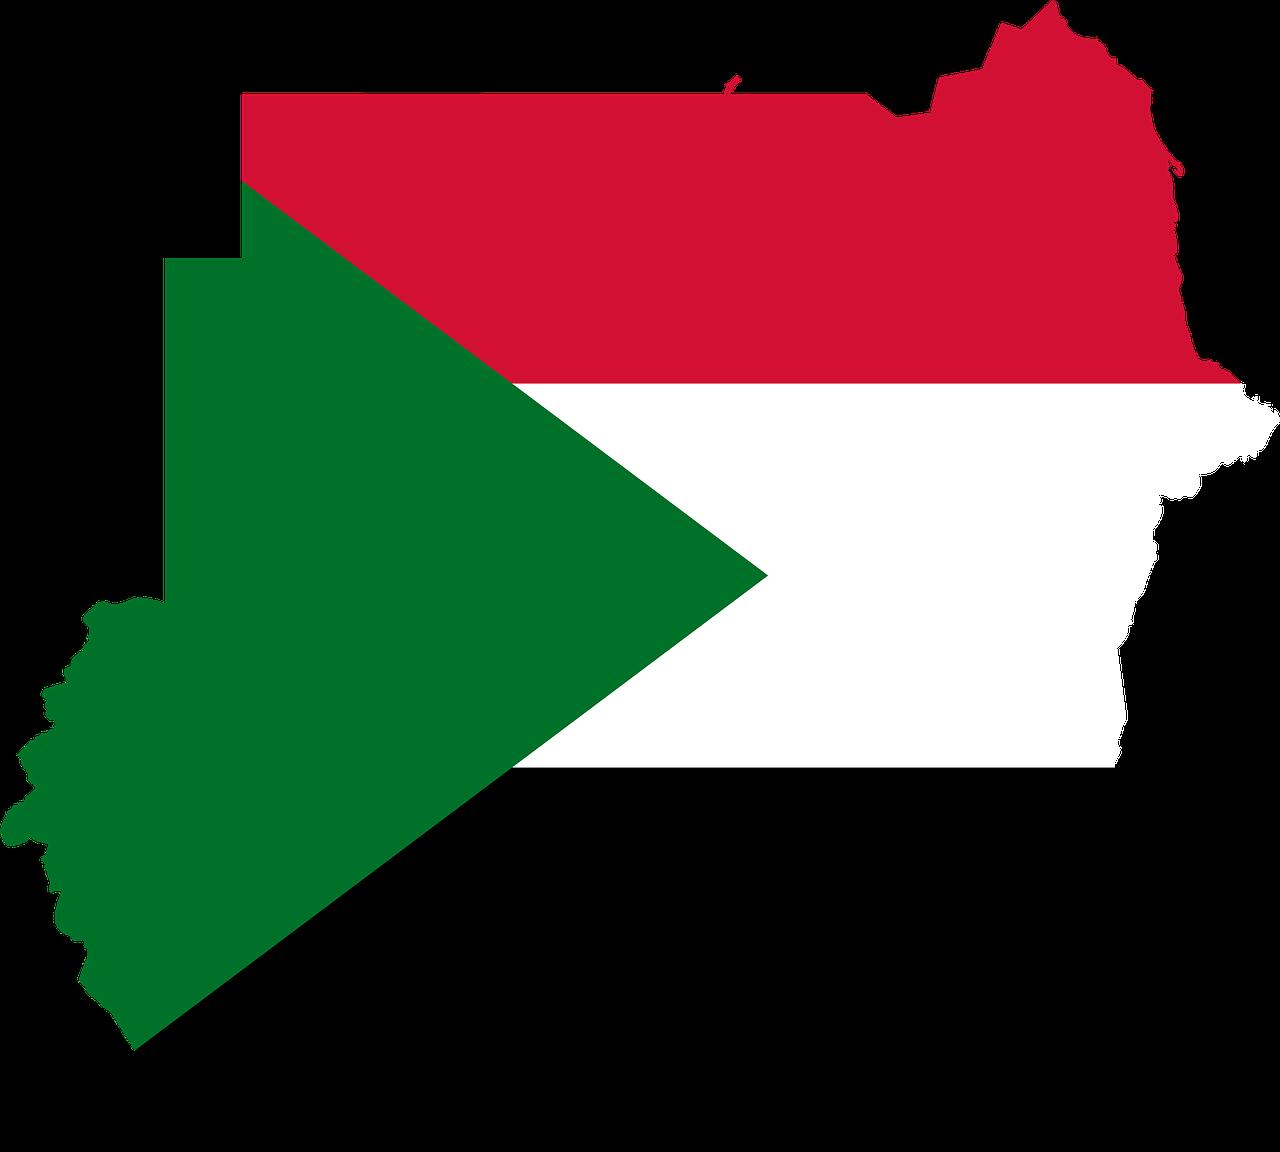 sudan, flag, map